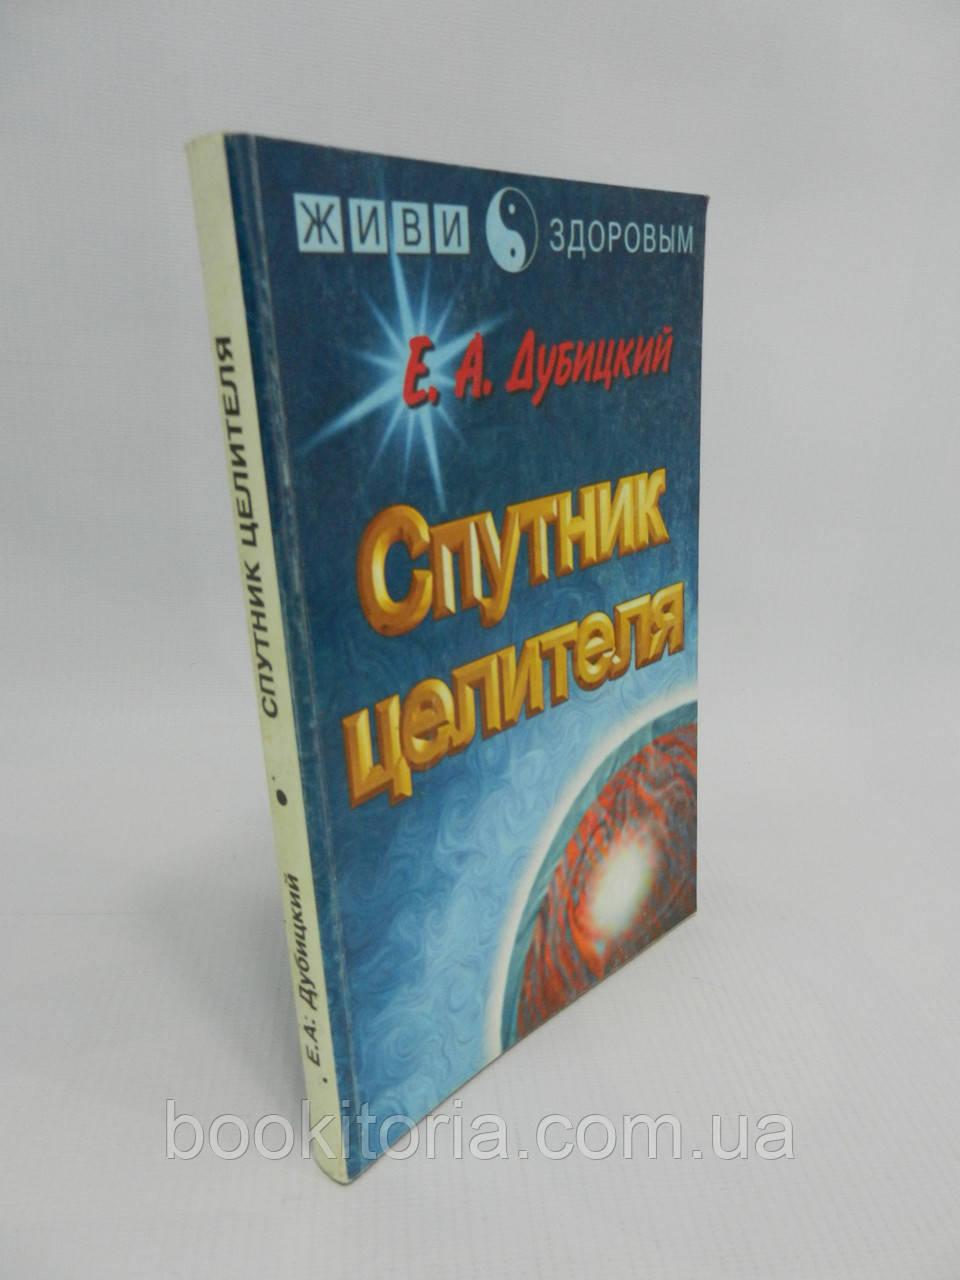 Дубицкий Е.А. Спутник целителя (б/у).